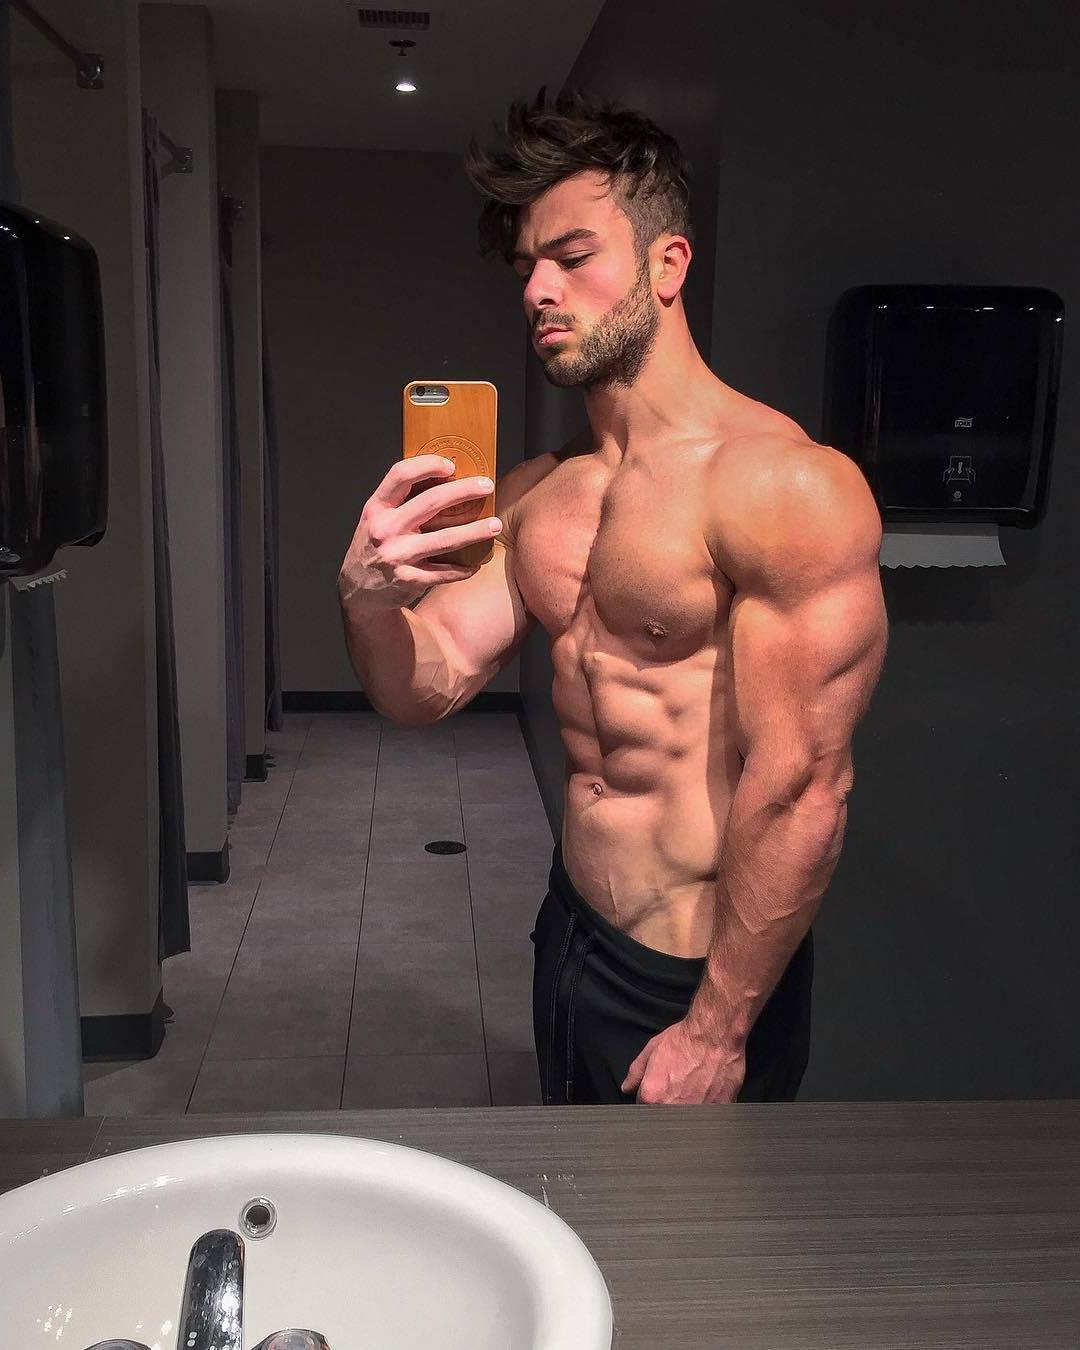 sexy-muscular-hunk-joey-hornyak-shirtless-body-huge-triceps-selfie-crazy-male-hairstyle